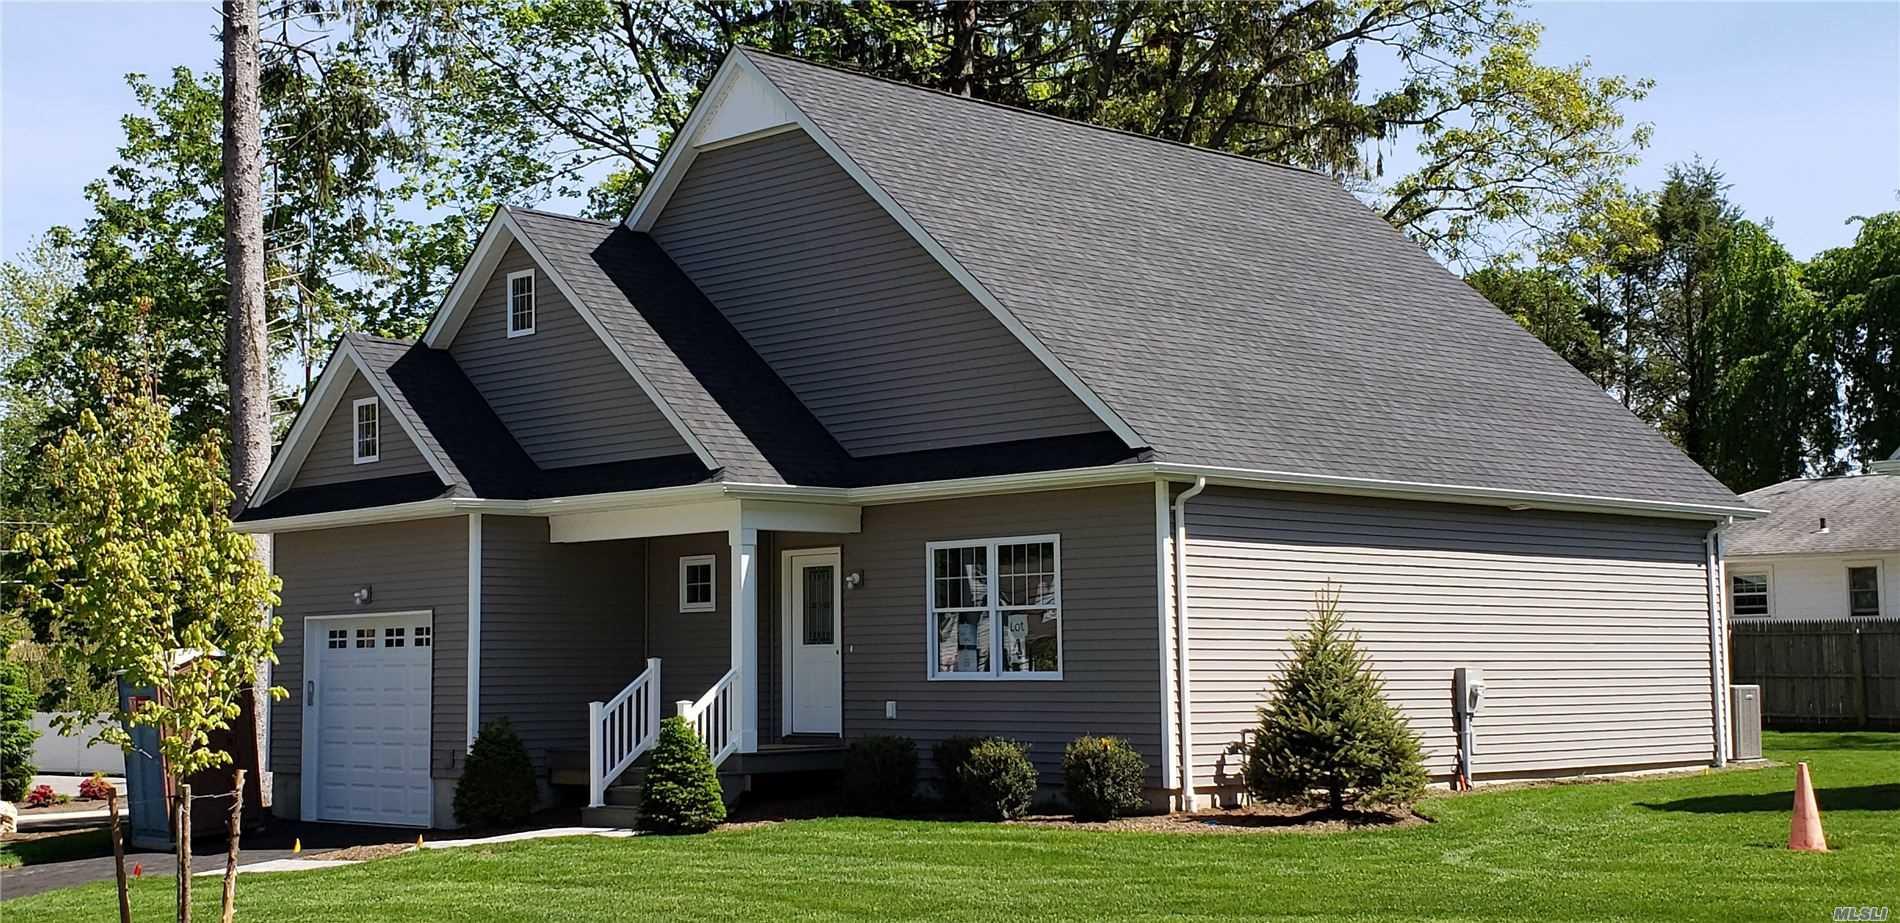 South Huntington Real Estate | Douglas Elliman